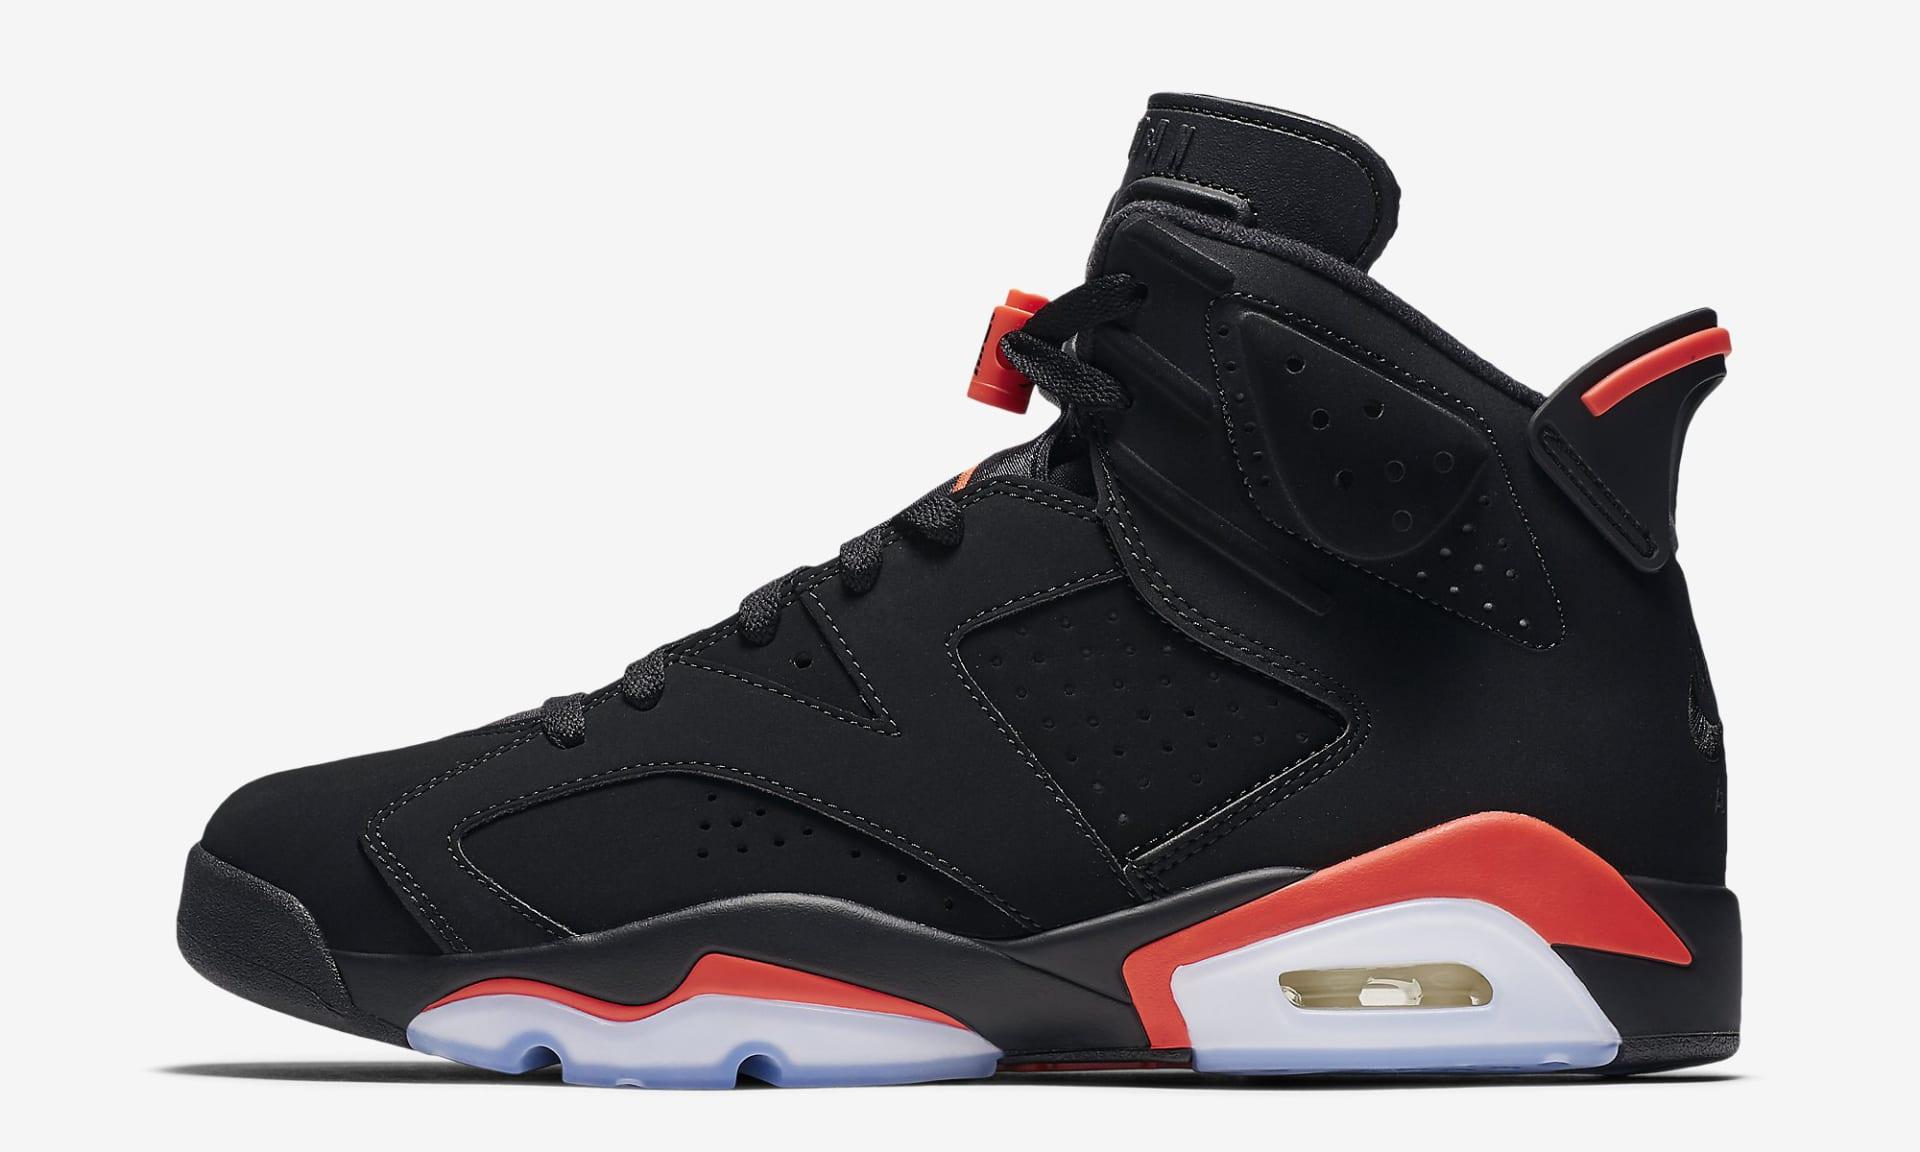 082f33b0d54 Best Air Jordan of 2019 (So Far): Air Jordans Releases of The Year ...